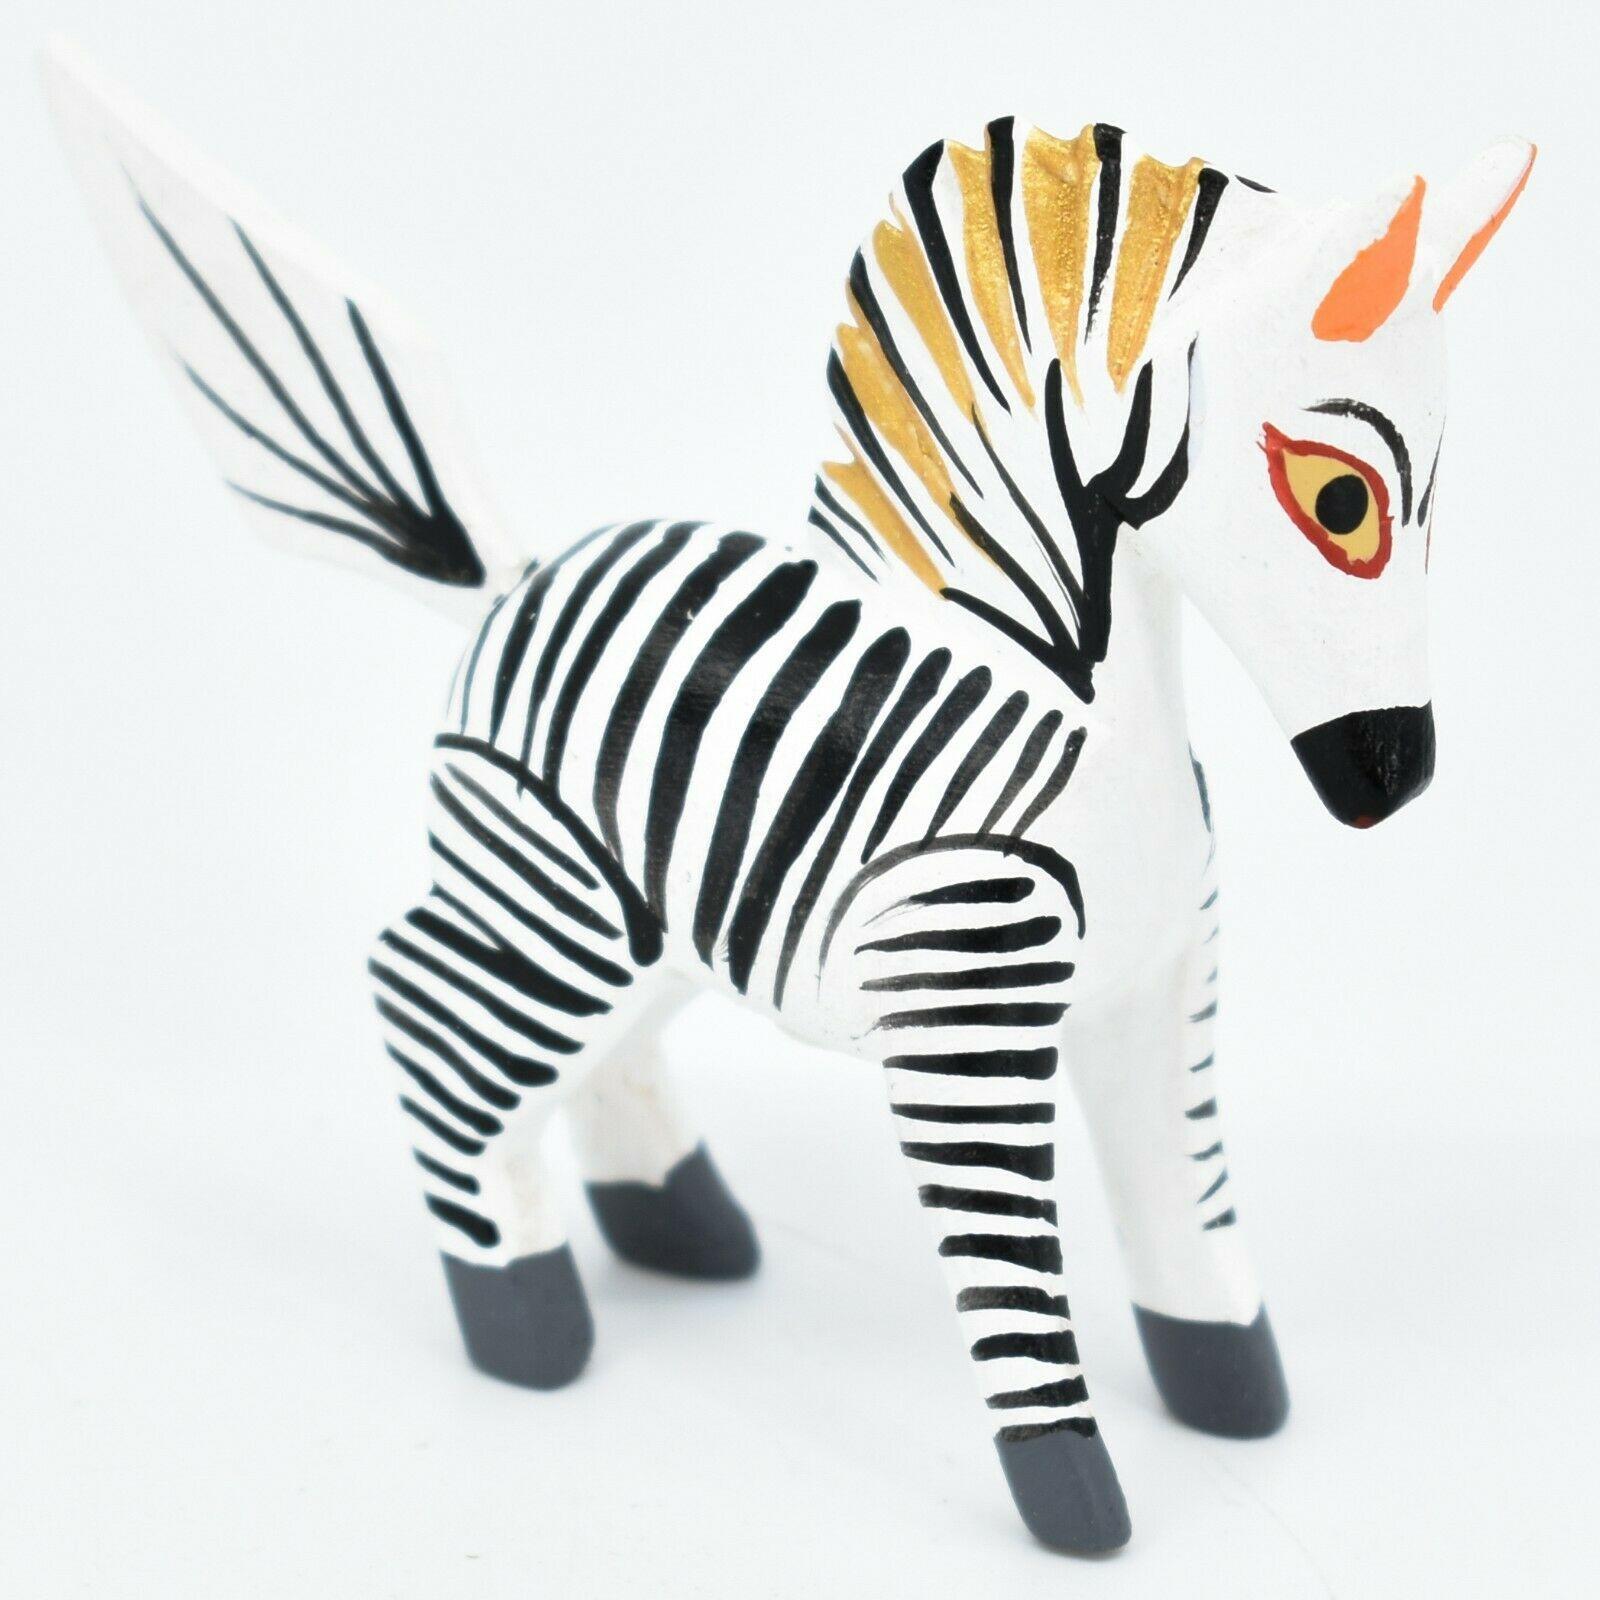 Oaxacan Alebrijes Copal Wood Carved Painted Folk Art Miniature Zebra Mini Figure